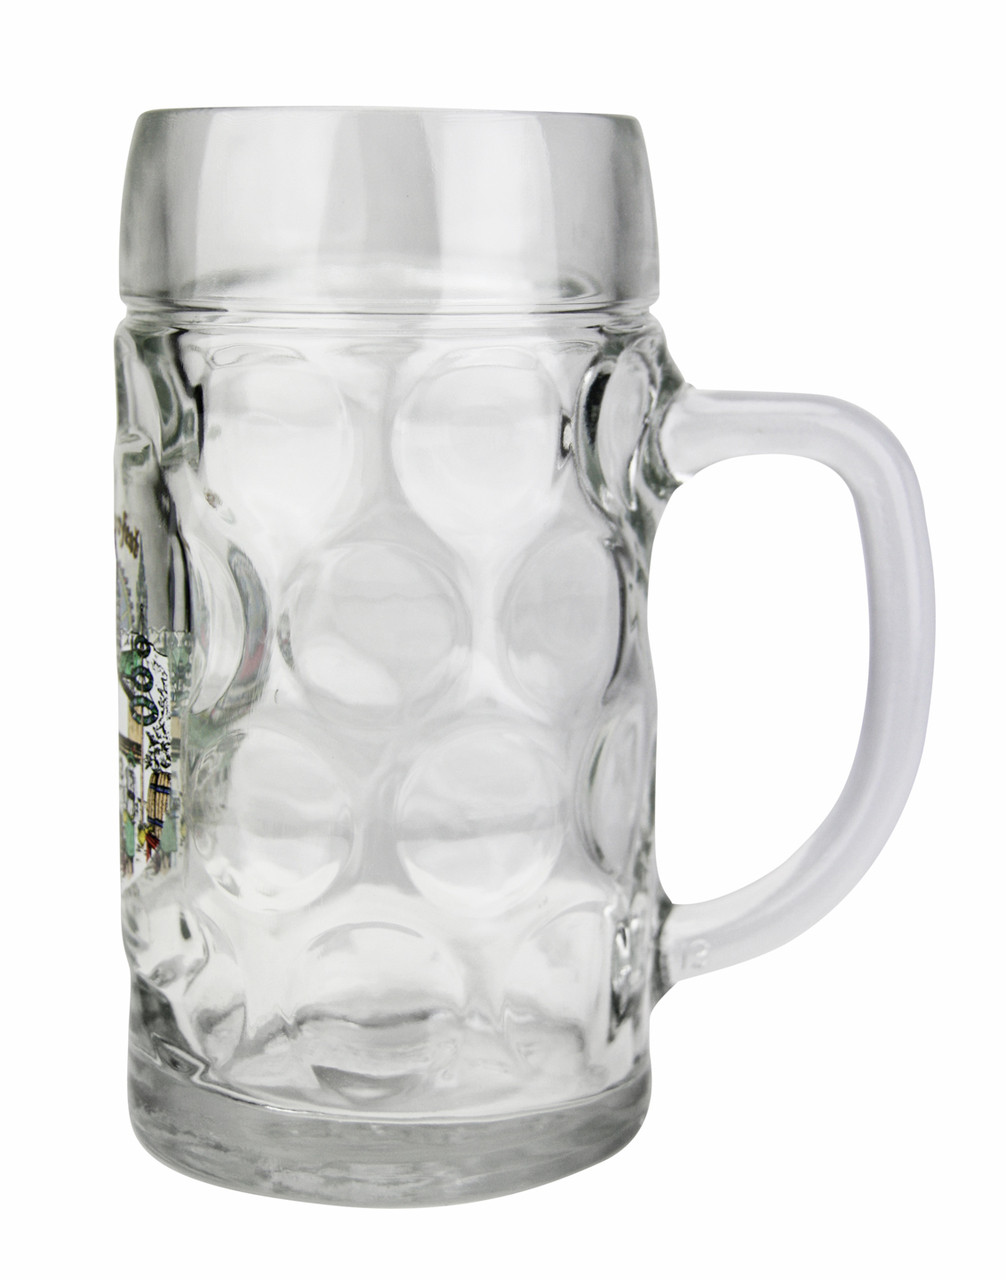 Custom Engraved Oktoberfest Munich Dimpled Oktoberfest Glass Beer Mug 0 5 Liter